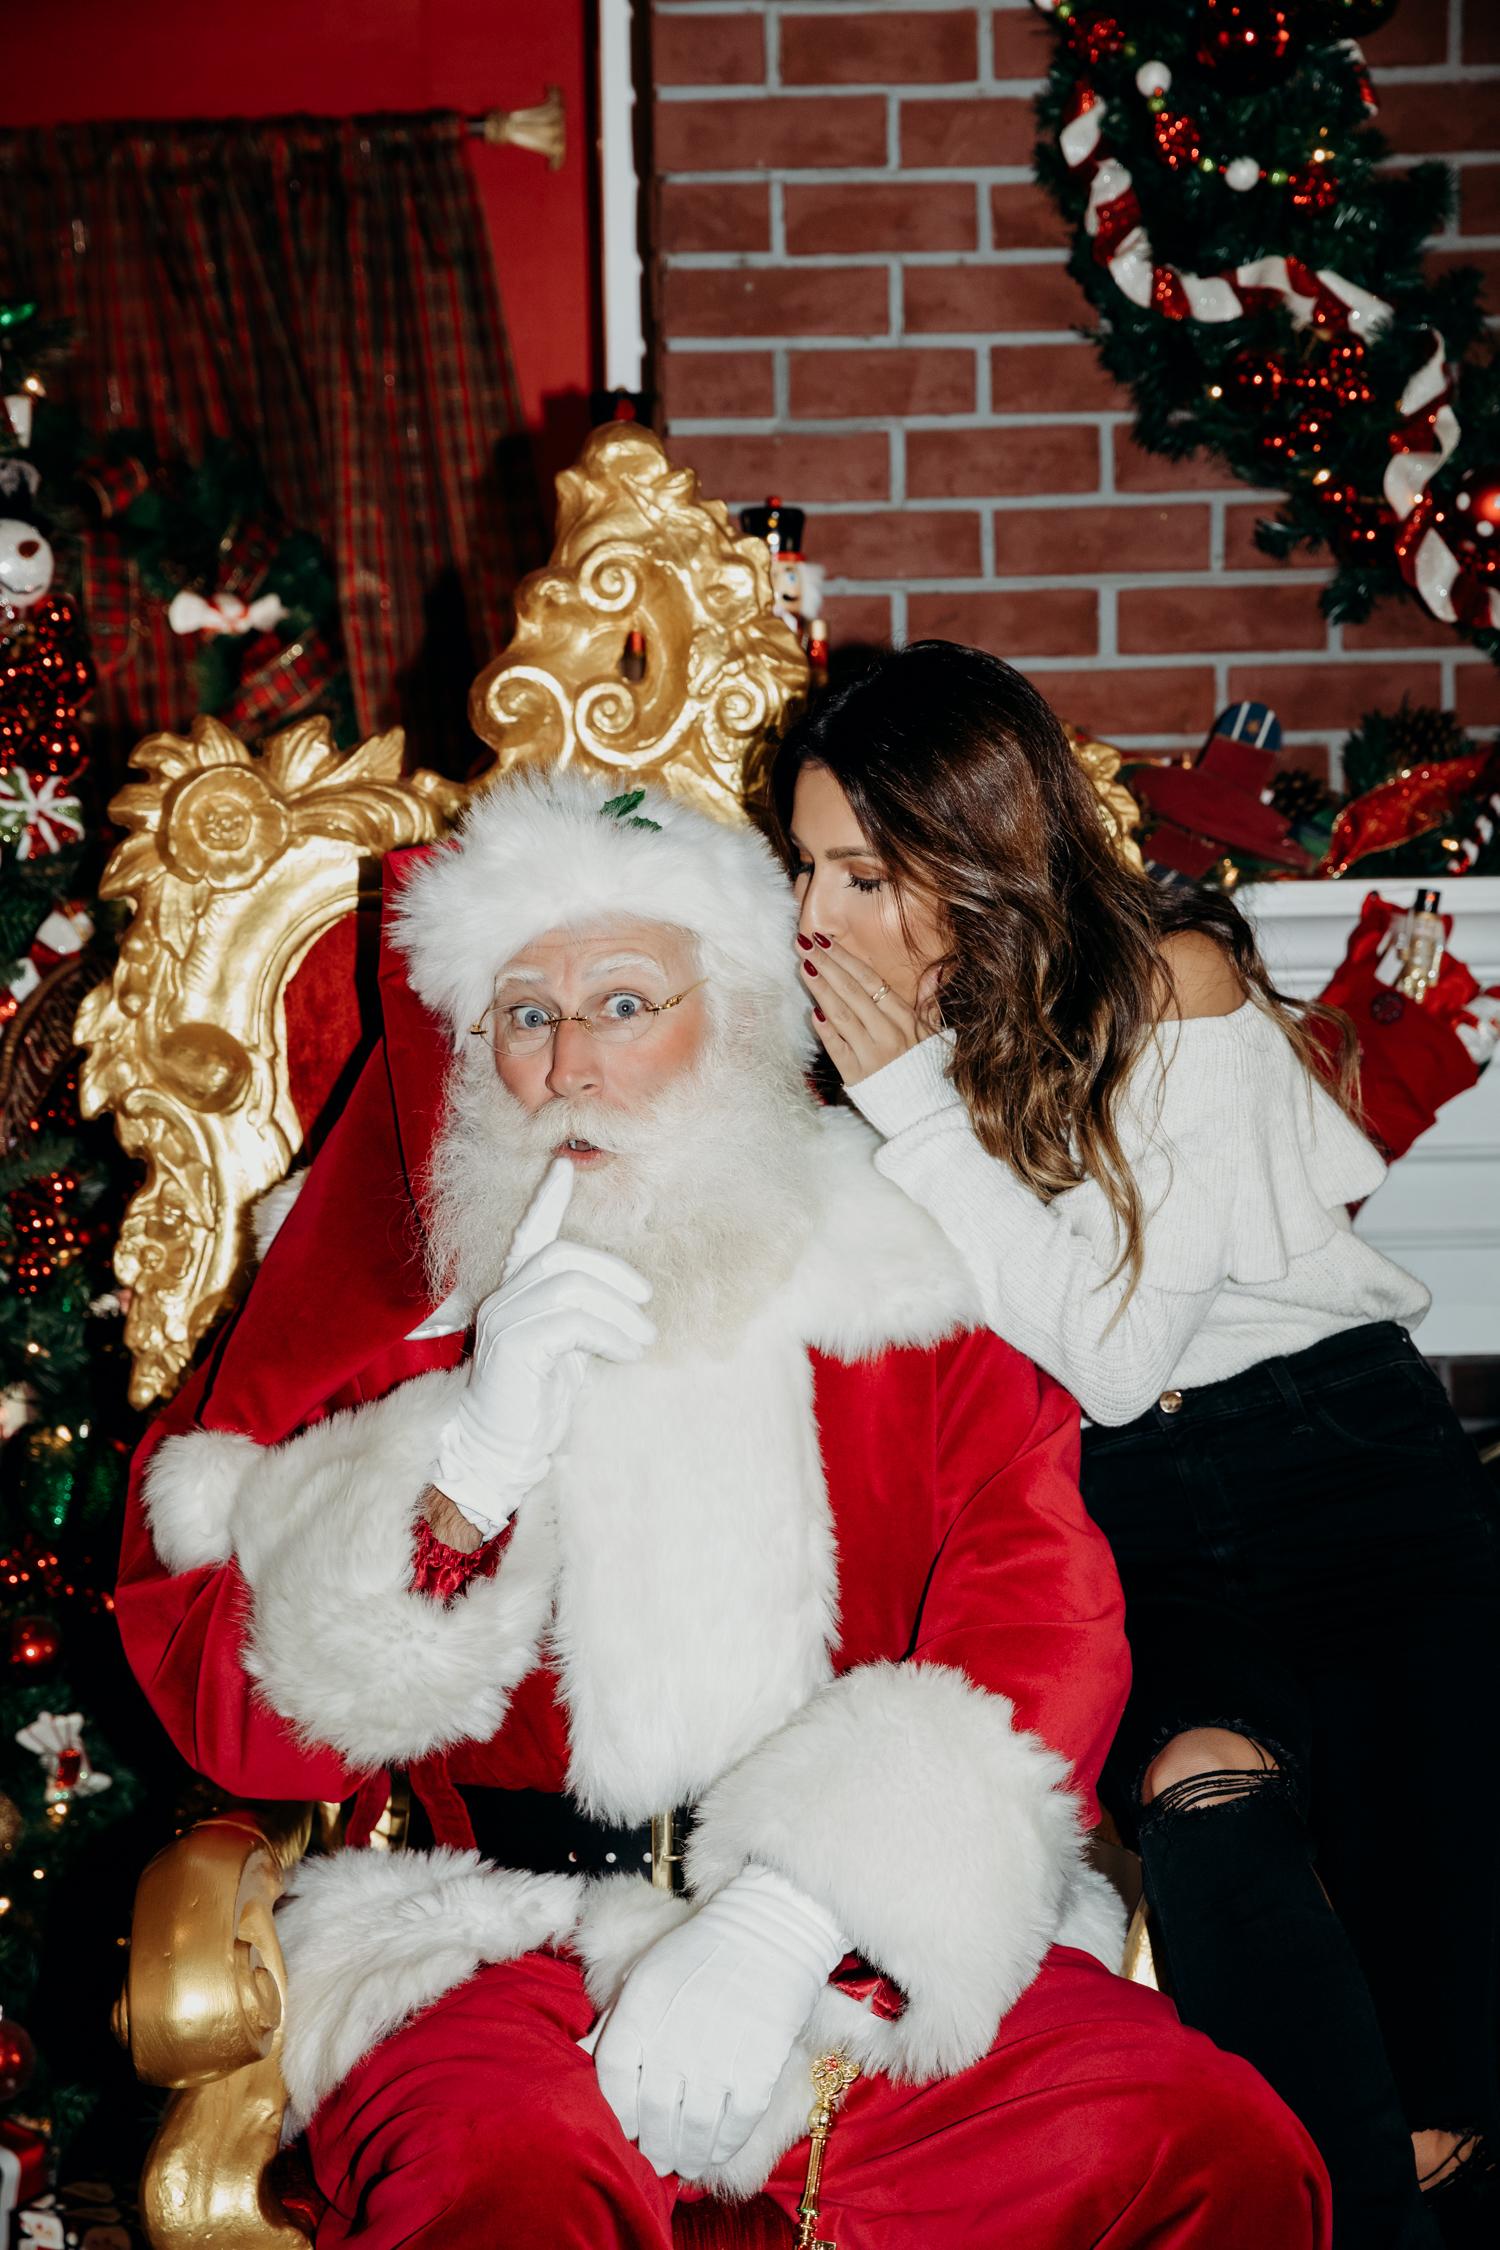 Ashley from Everyday Pursuits visiting Santa at the Americana